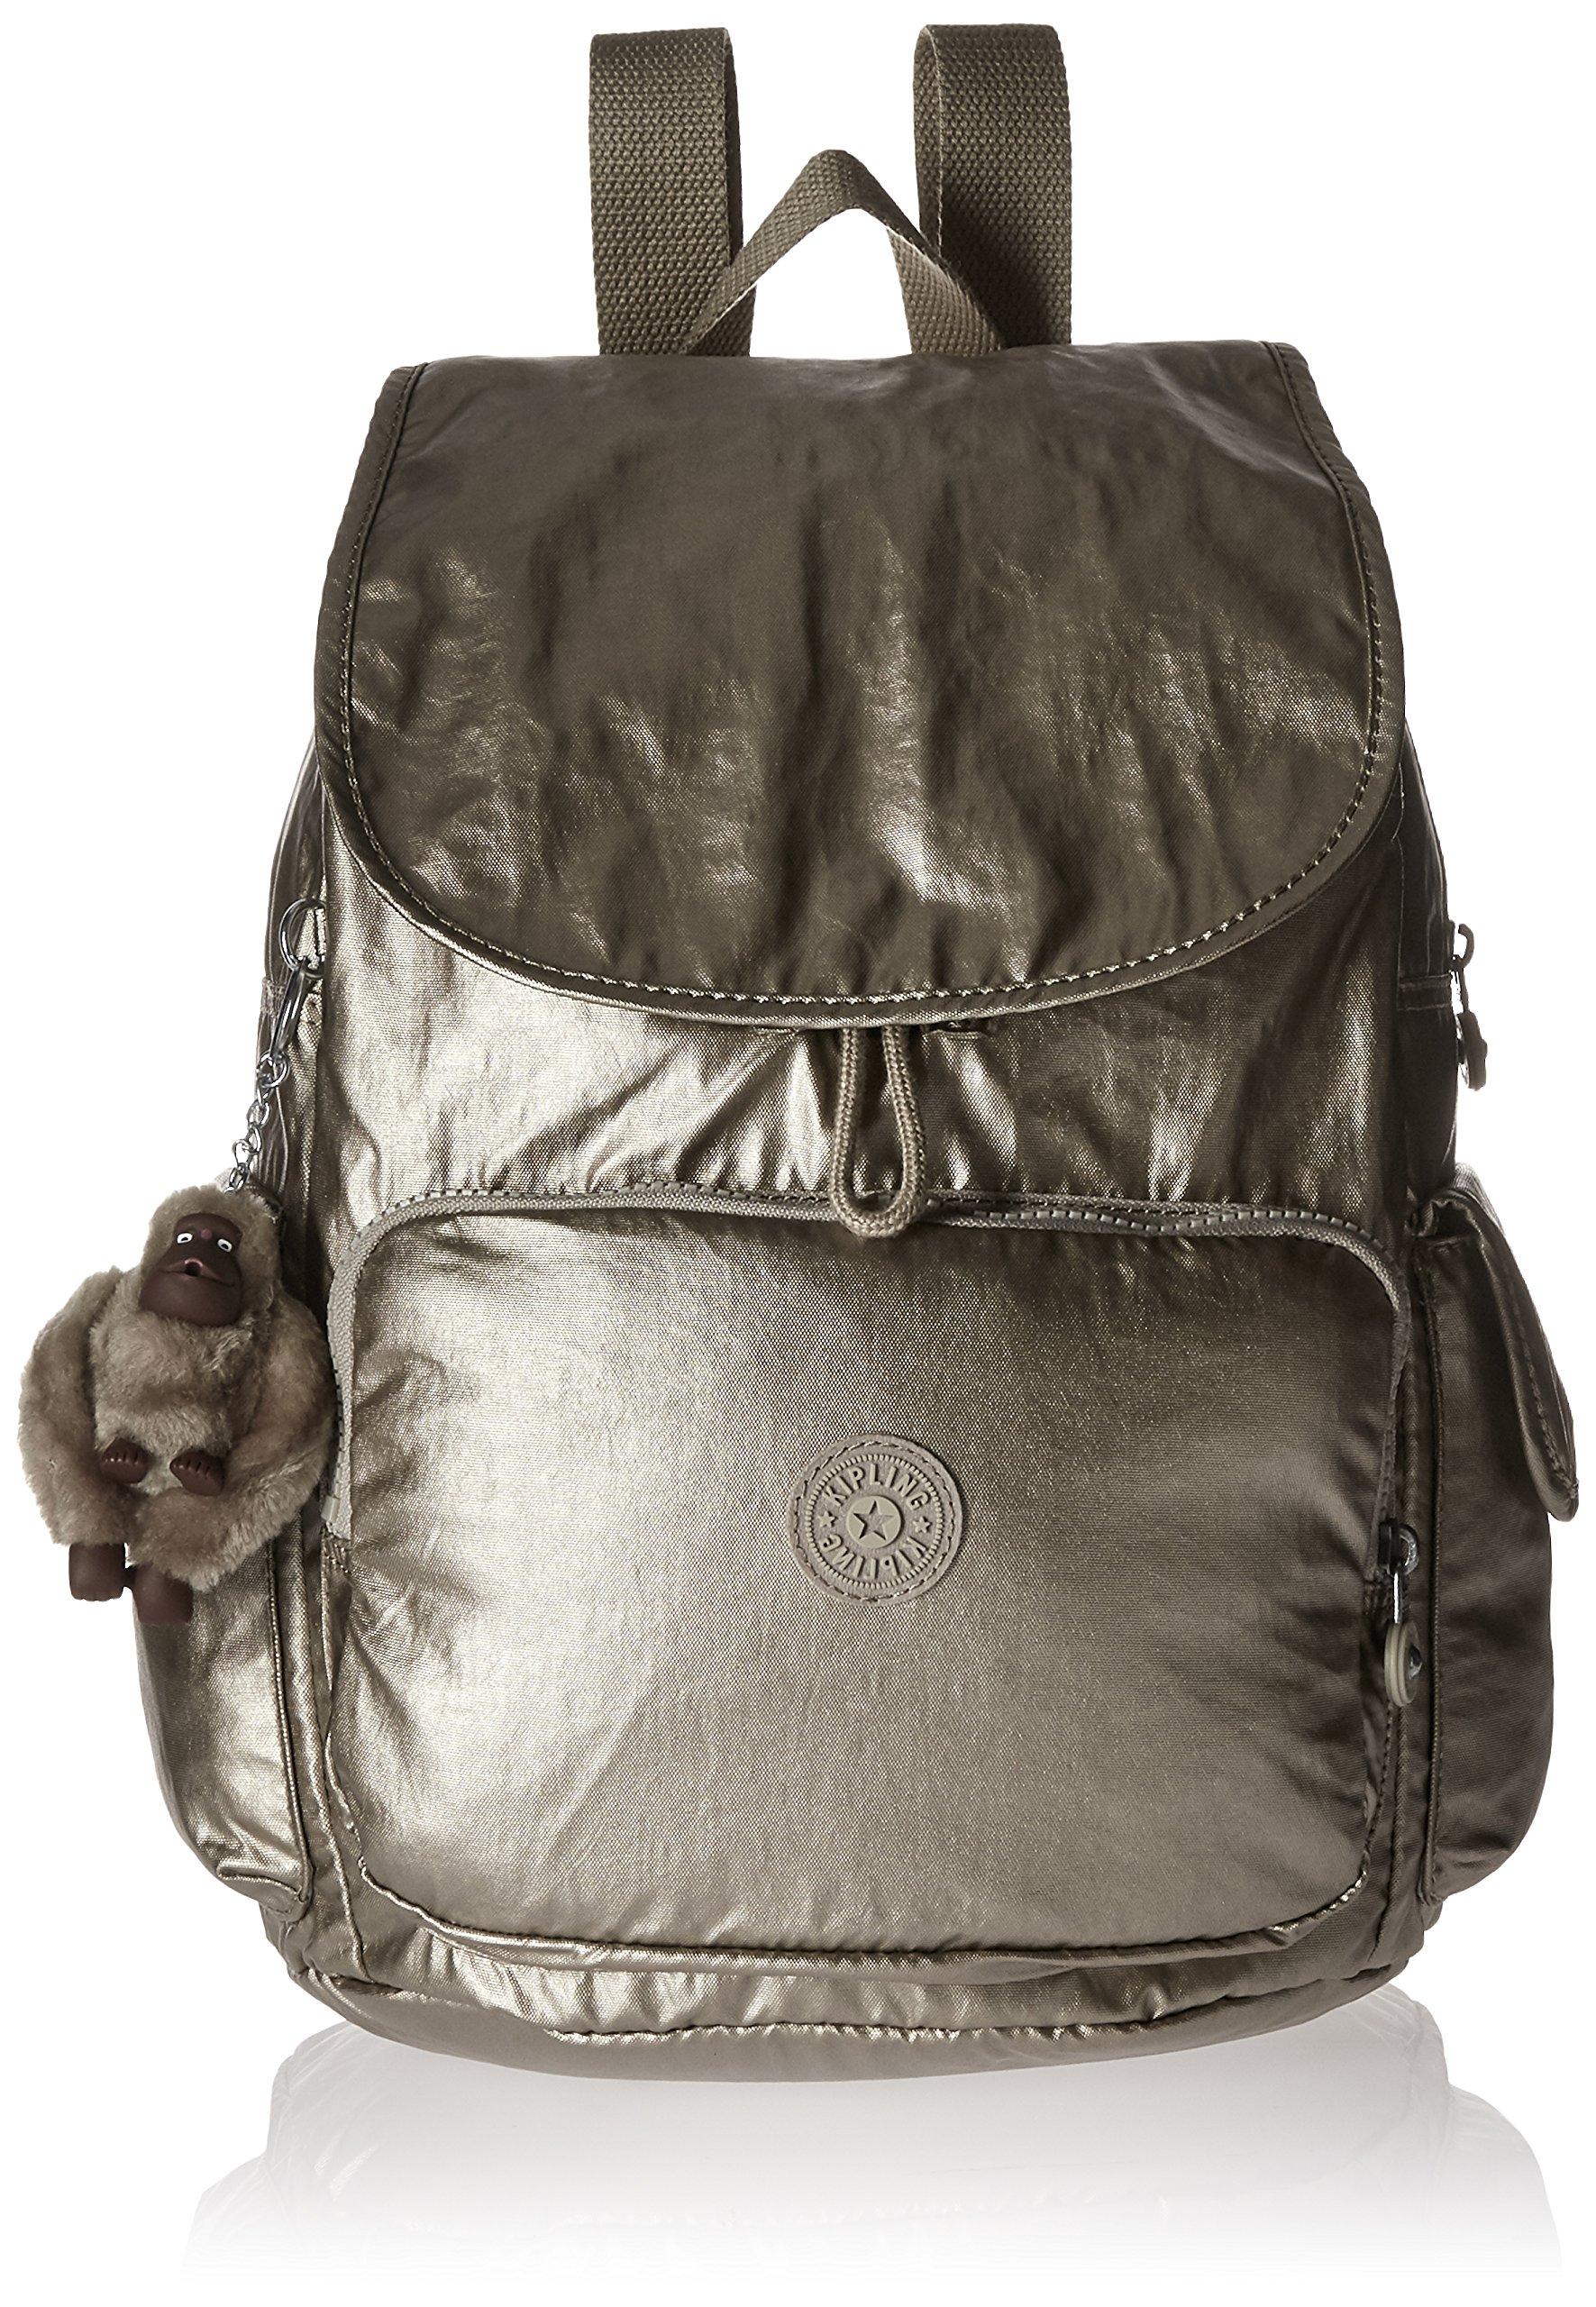 Kipling Women's Ravier Medium Solid Backpack, Champagne Metallic